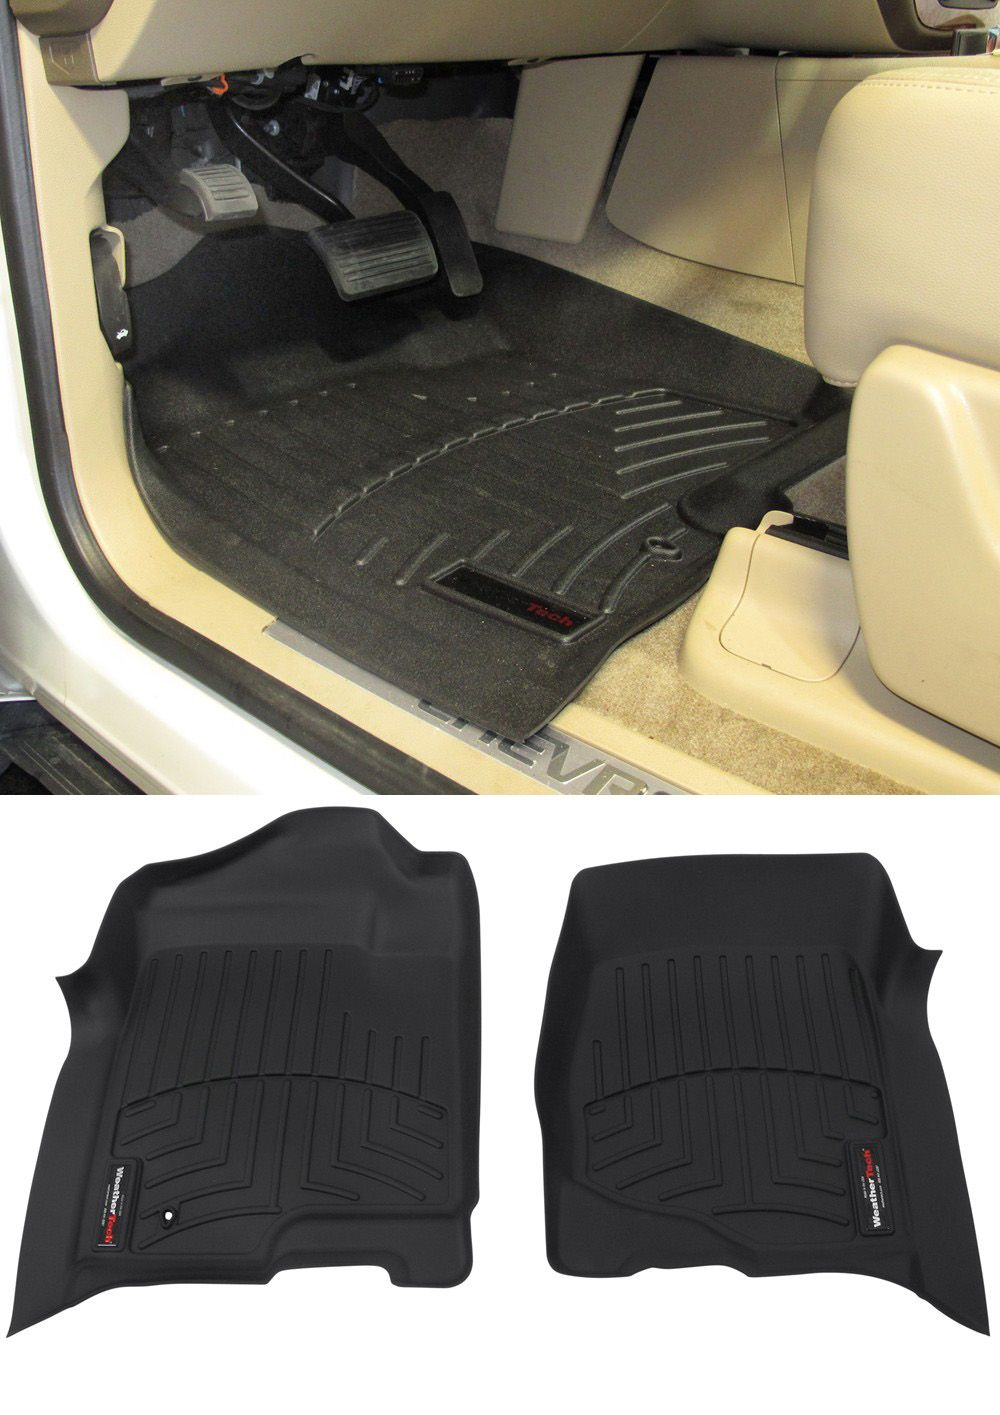 2013 Chevrolet Silverado Floor Mats WeatherTech Chevy